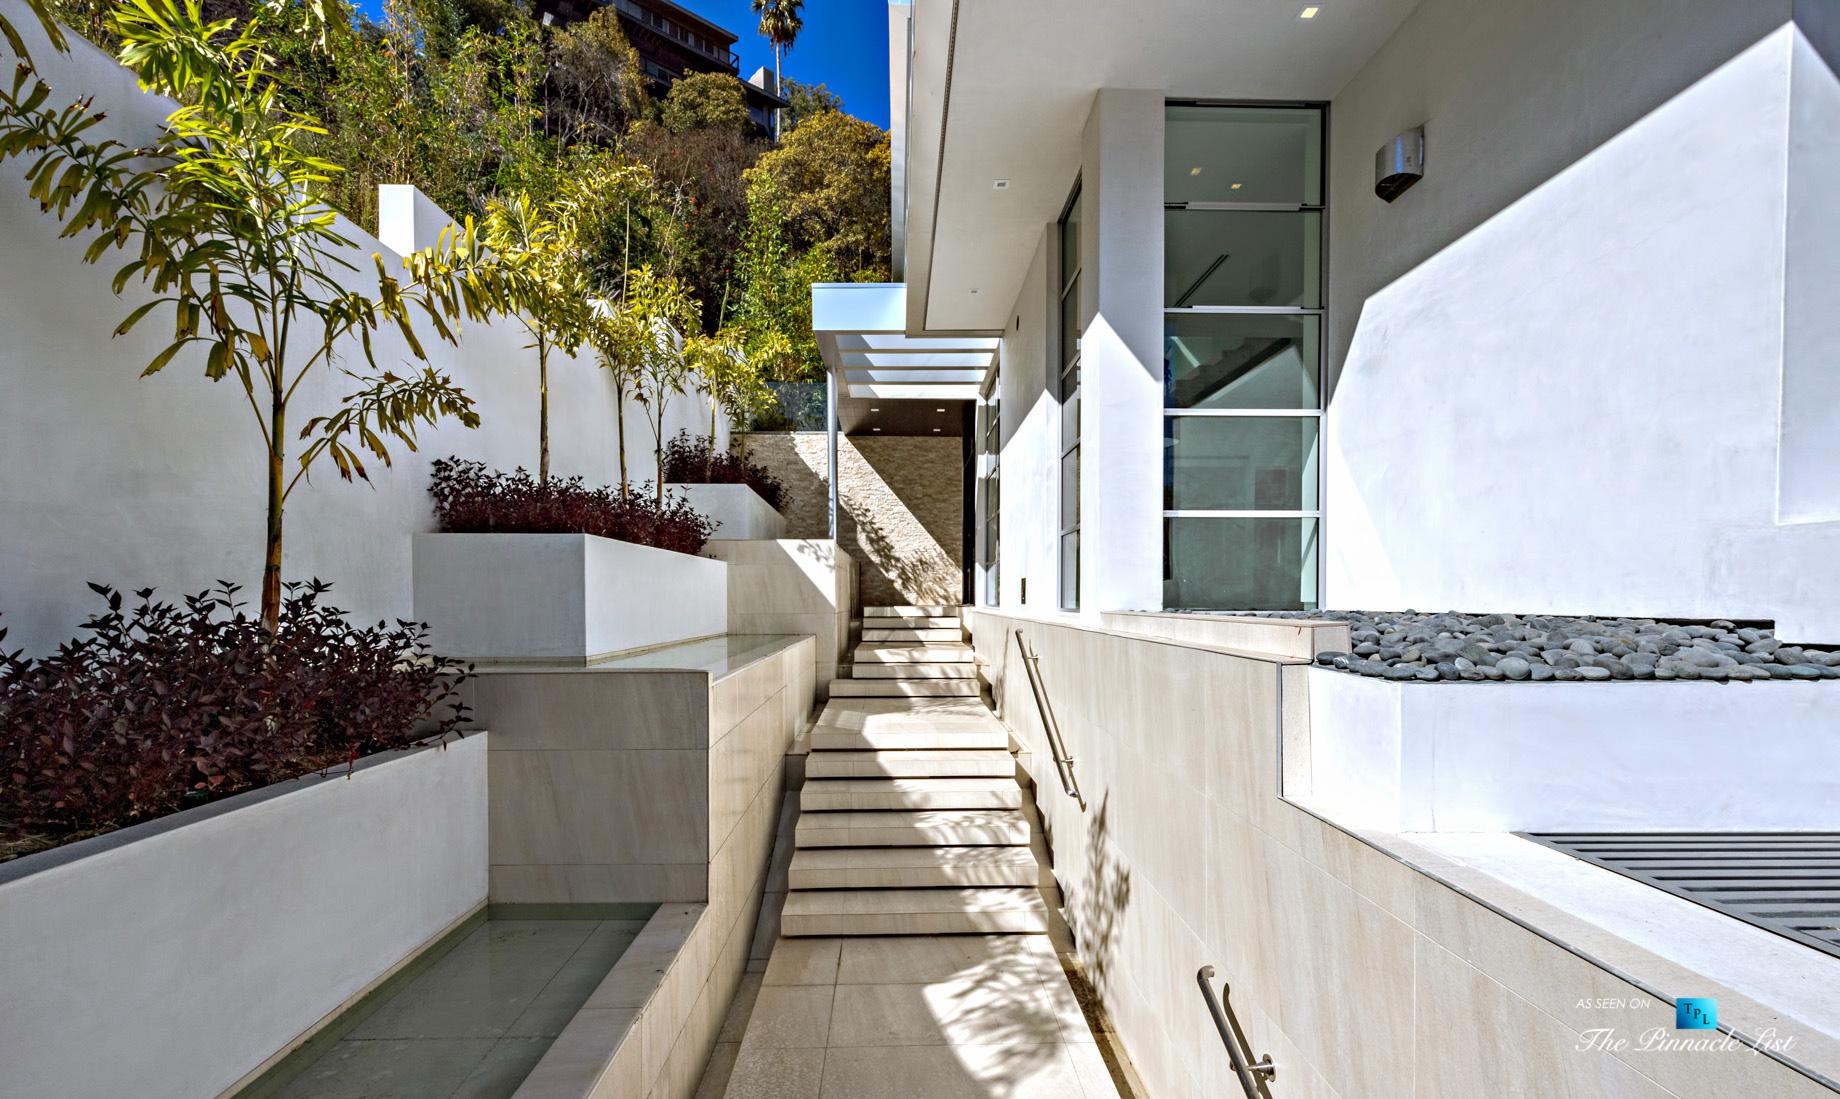 9311 Readcrest Dr, Beverly Hills, CA, USA